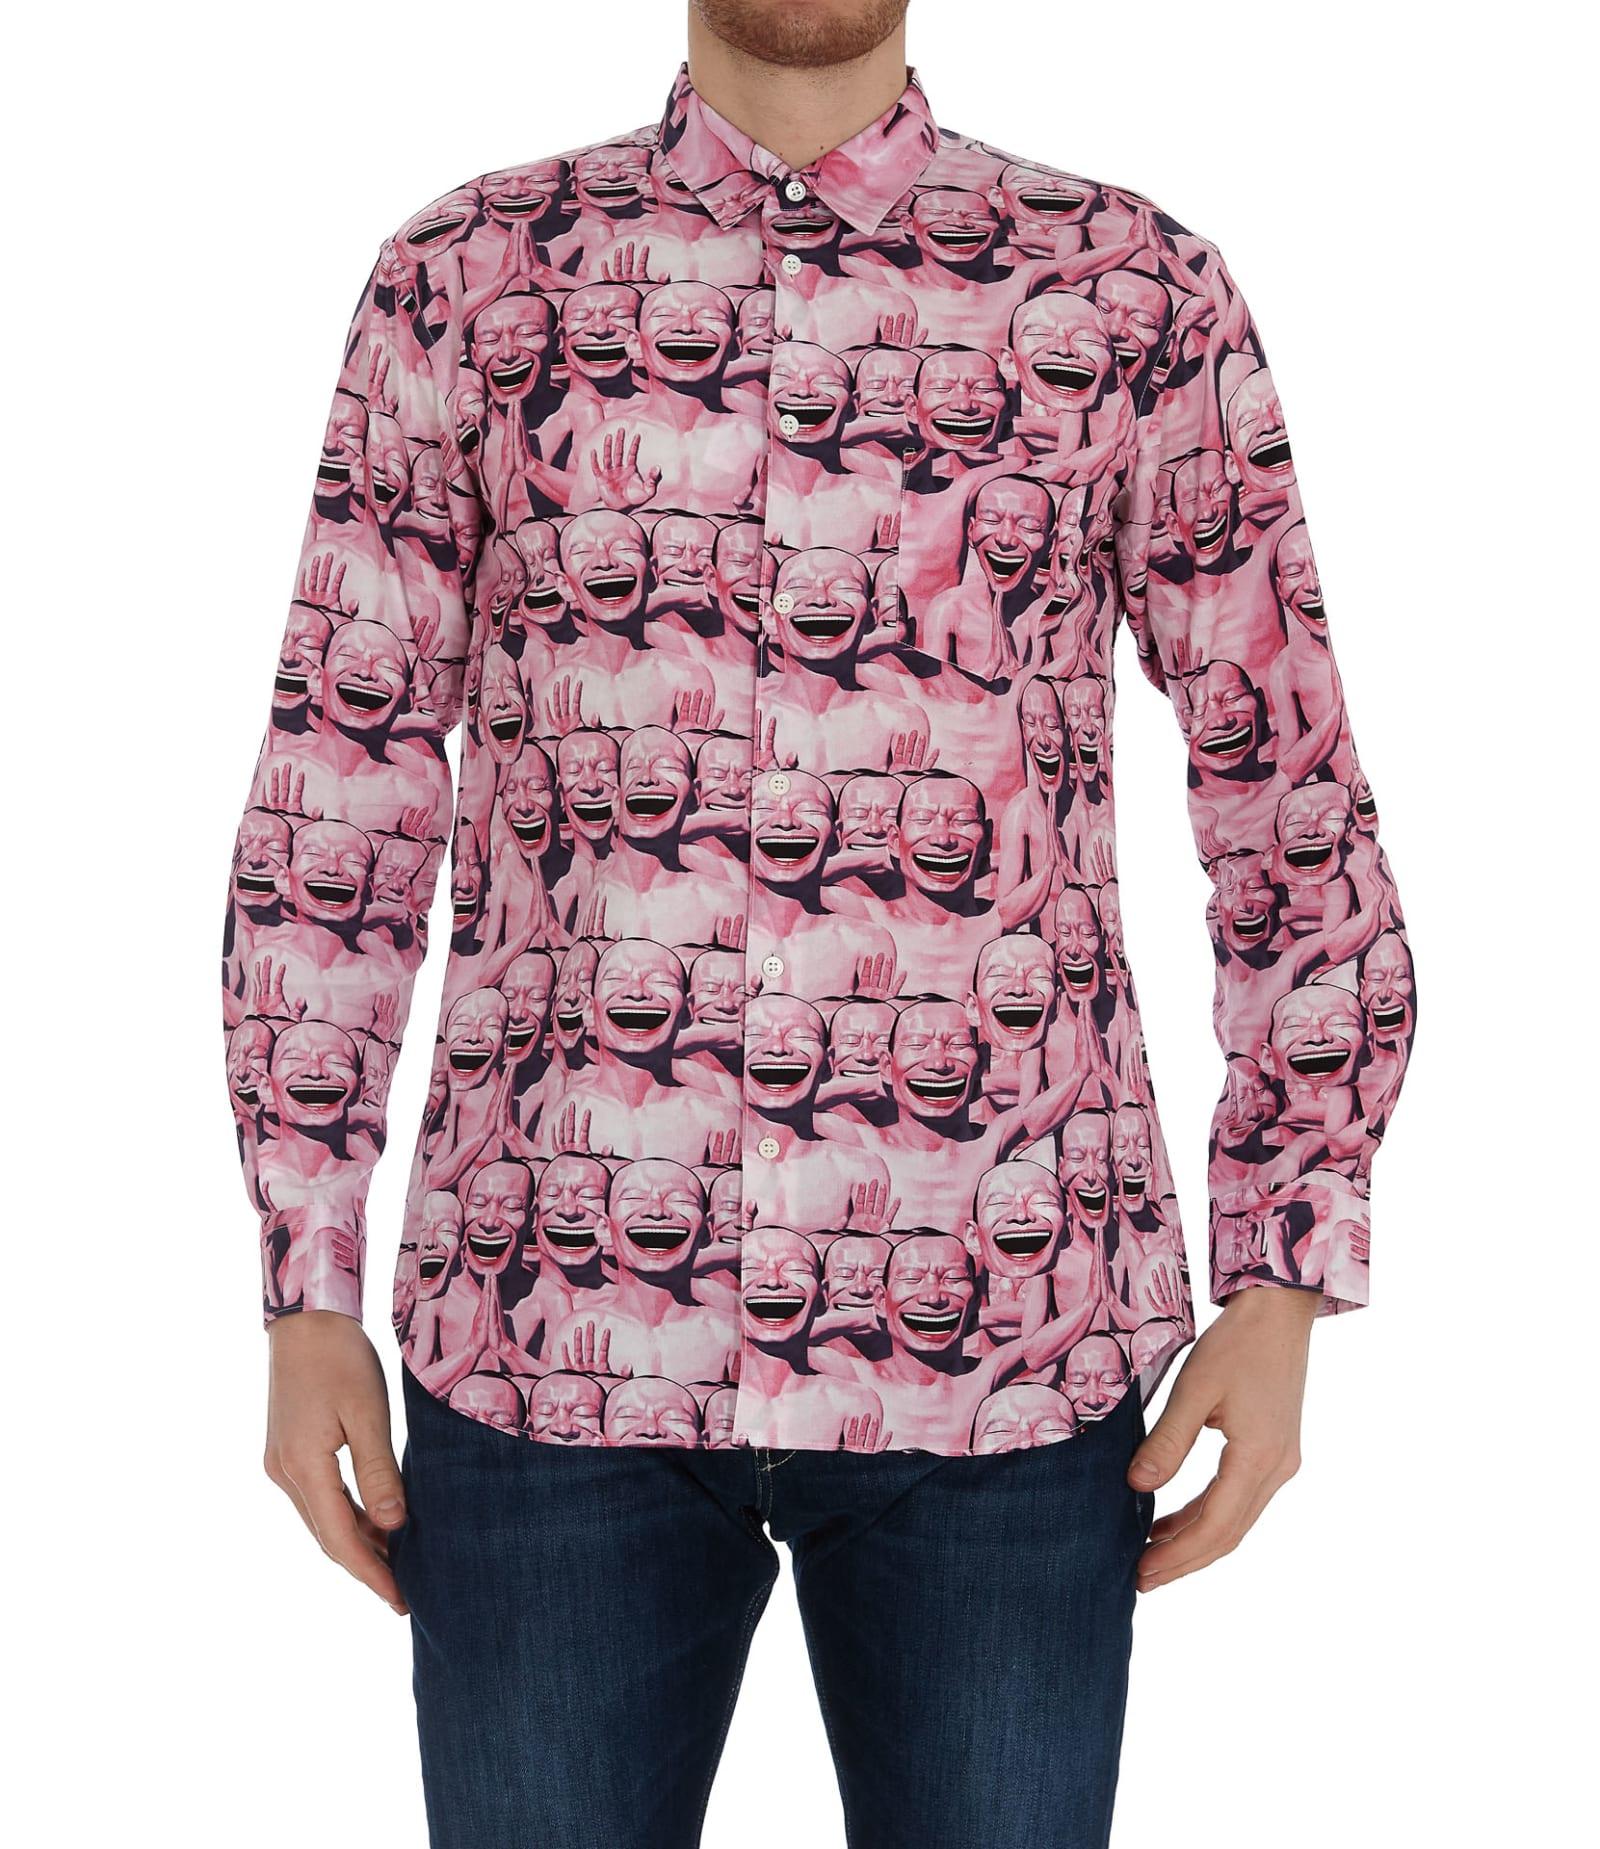 Comme Des Garçons Shirt Clothing COMME DES GARÇONS SHIRT TUE MINJUN PRINT SHIRT